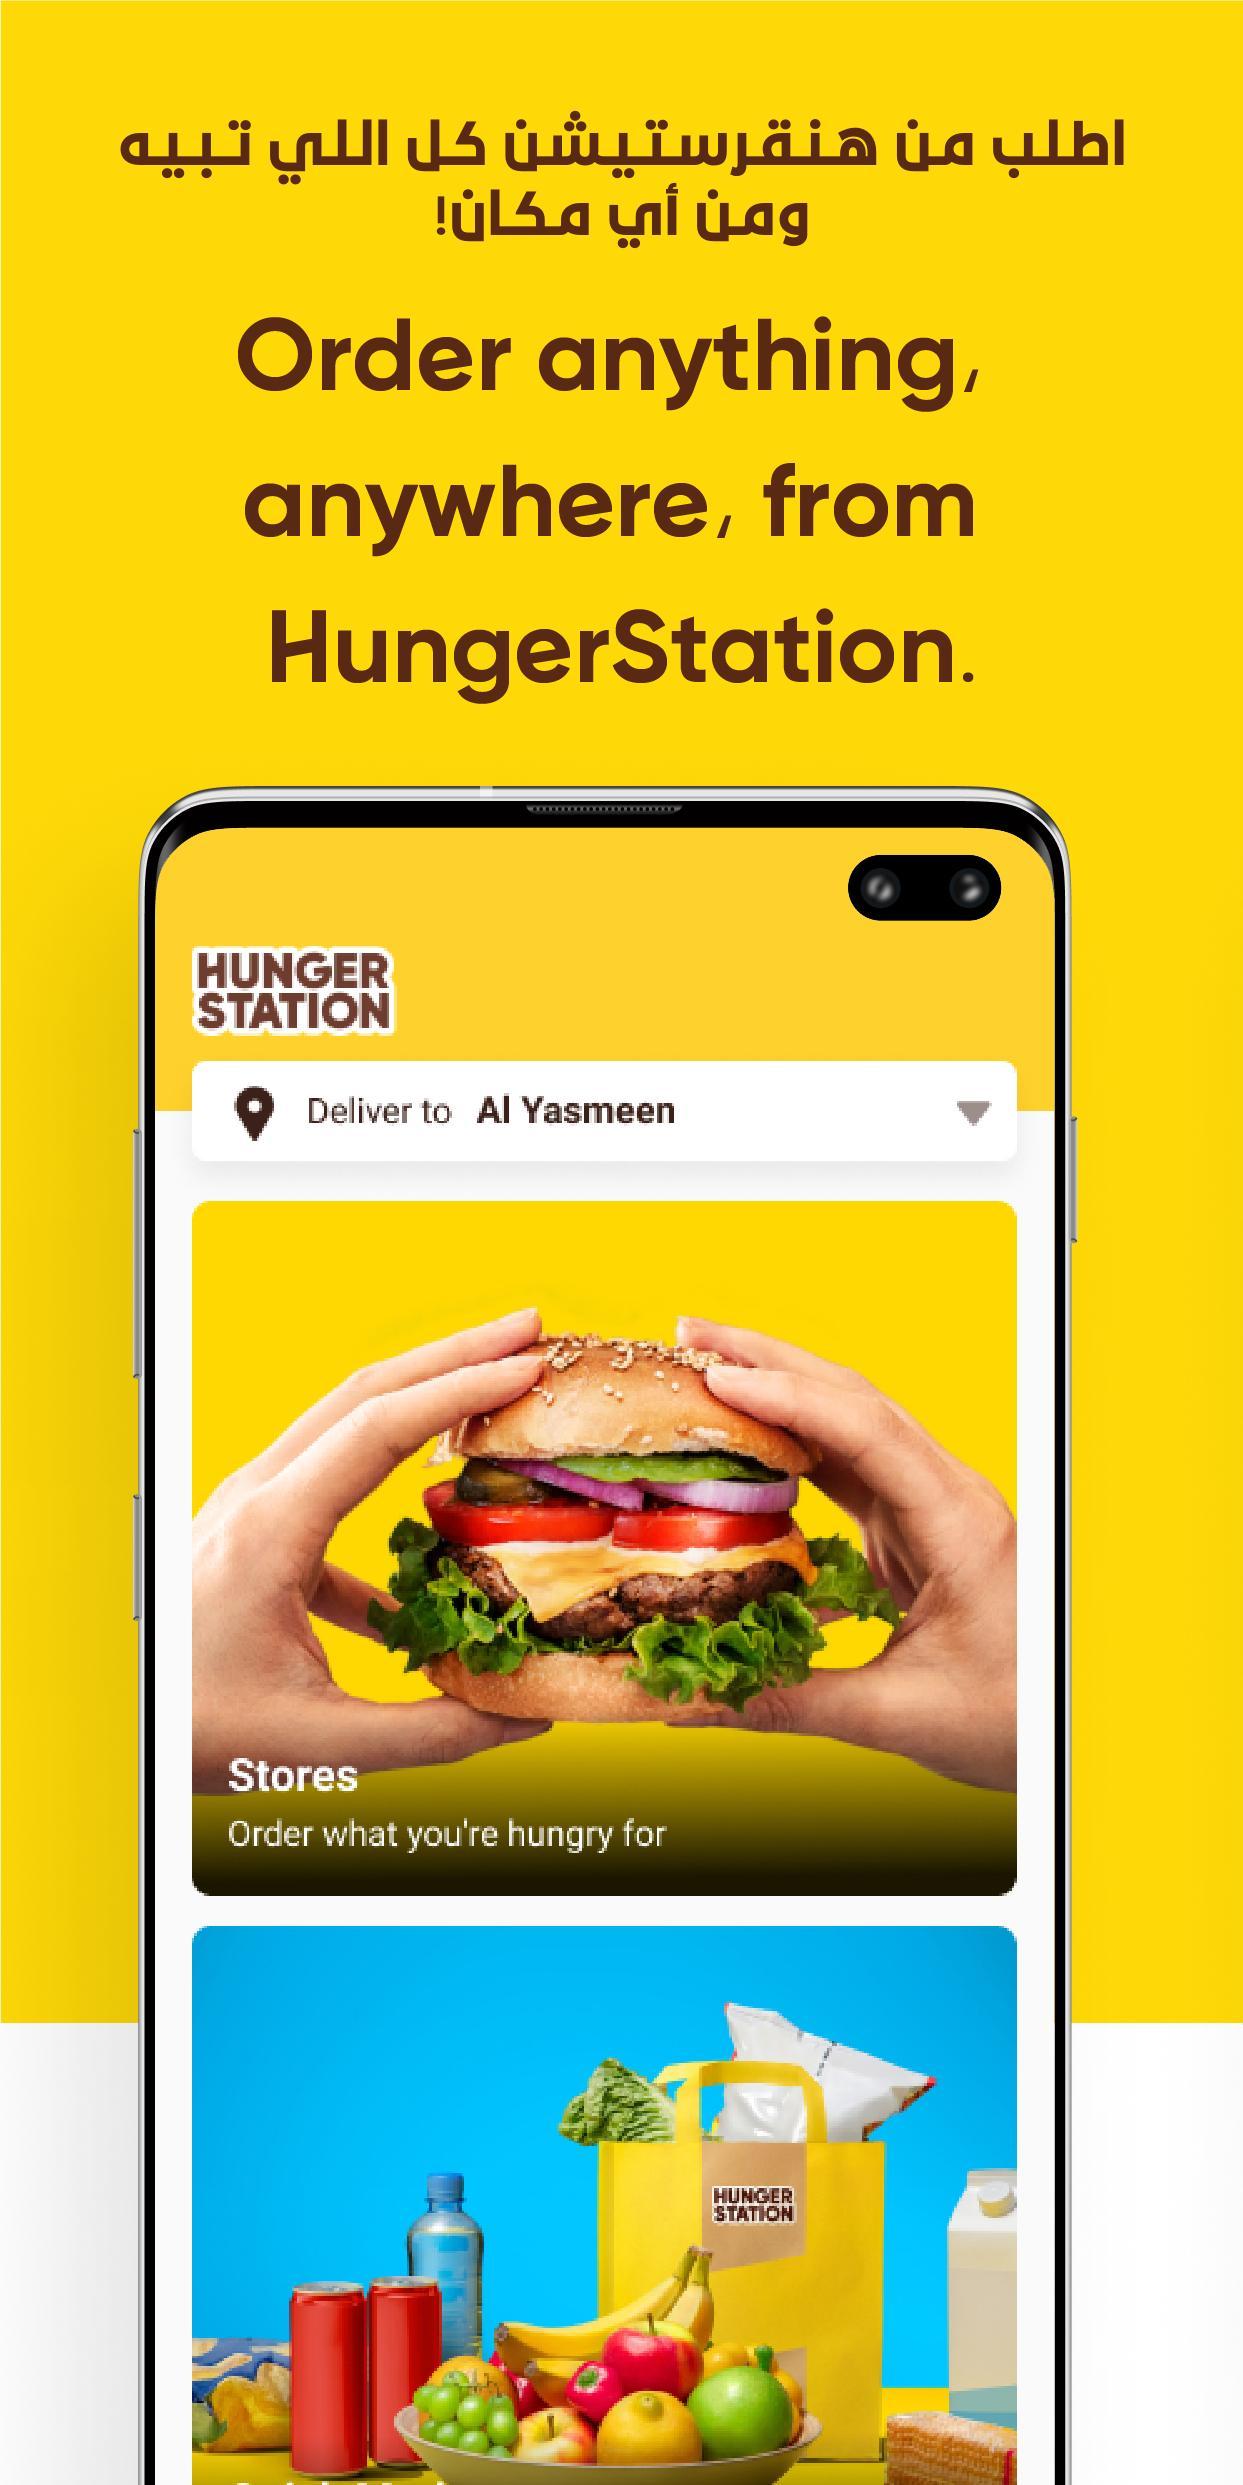 HungerStation Food, Groceries Delivery & More 8.0.1 Screenshot 1